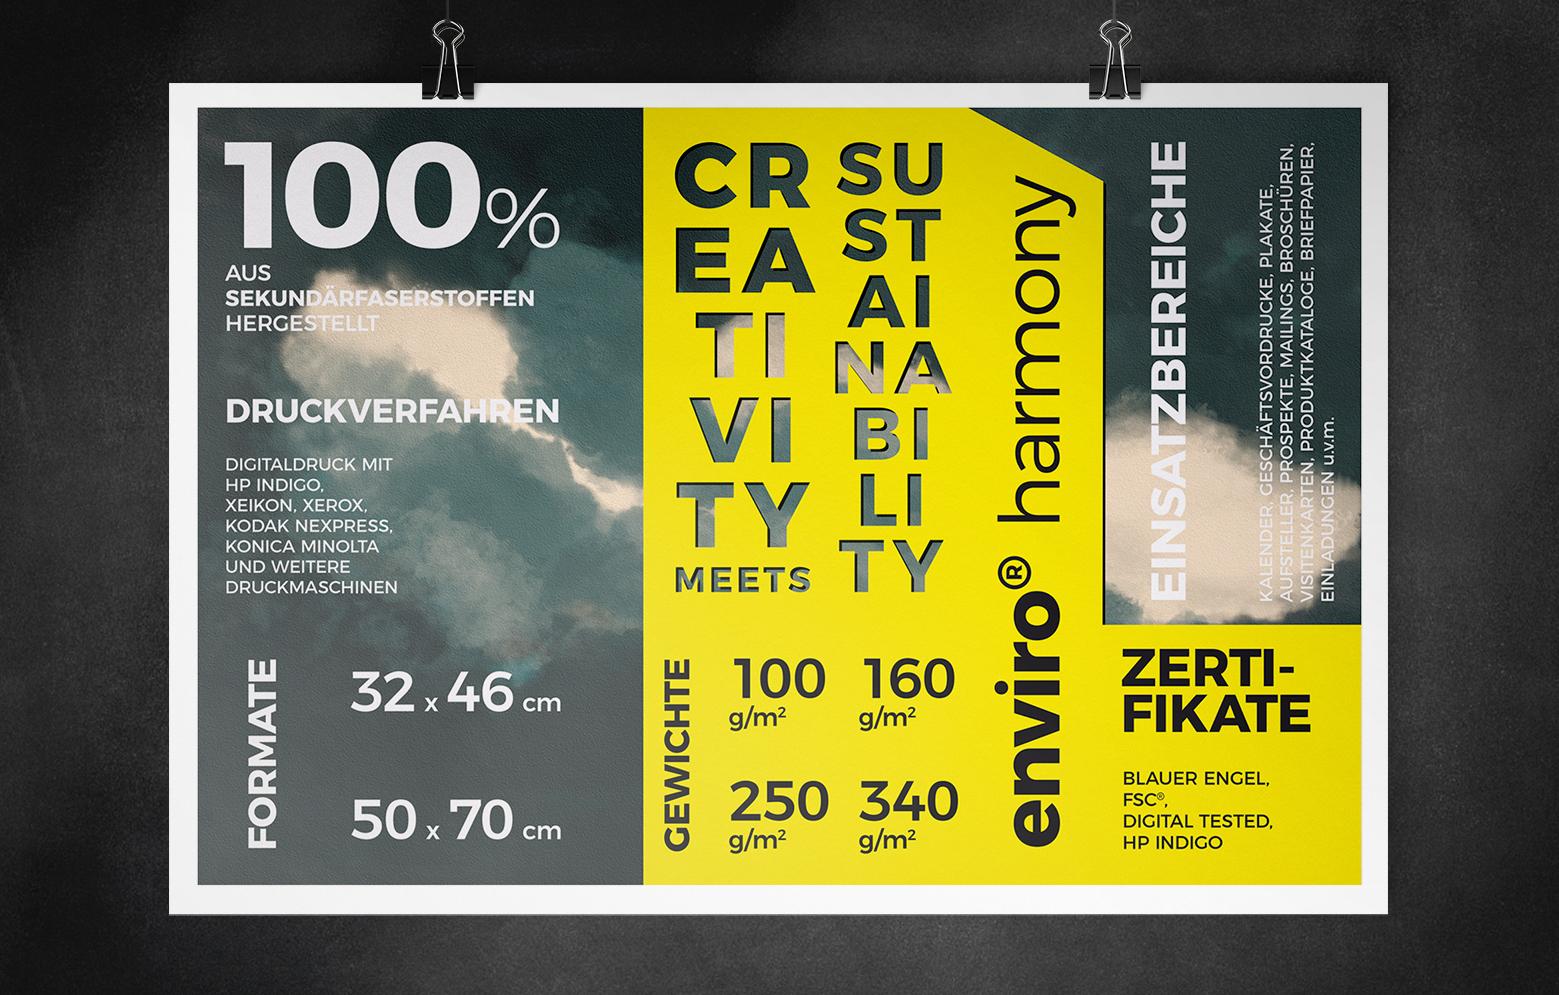 Poster Inapa enviro harmony mit seinen Features